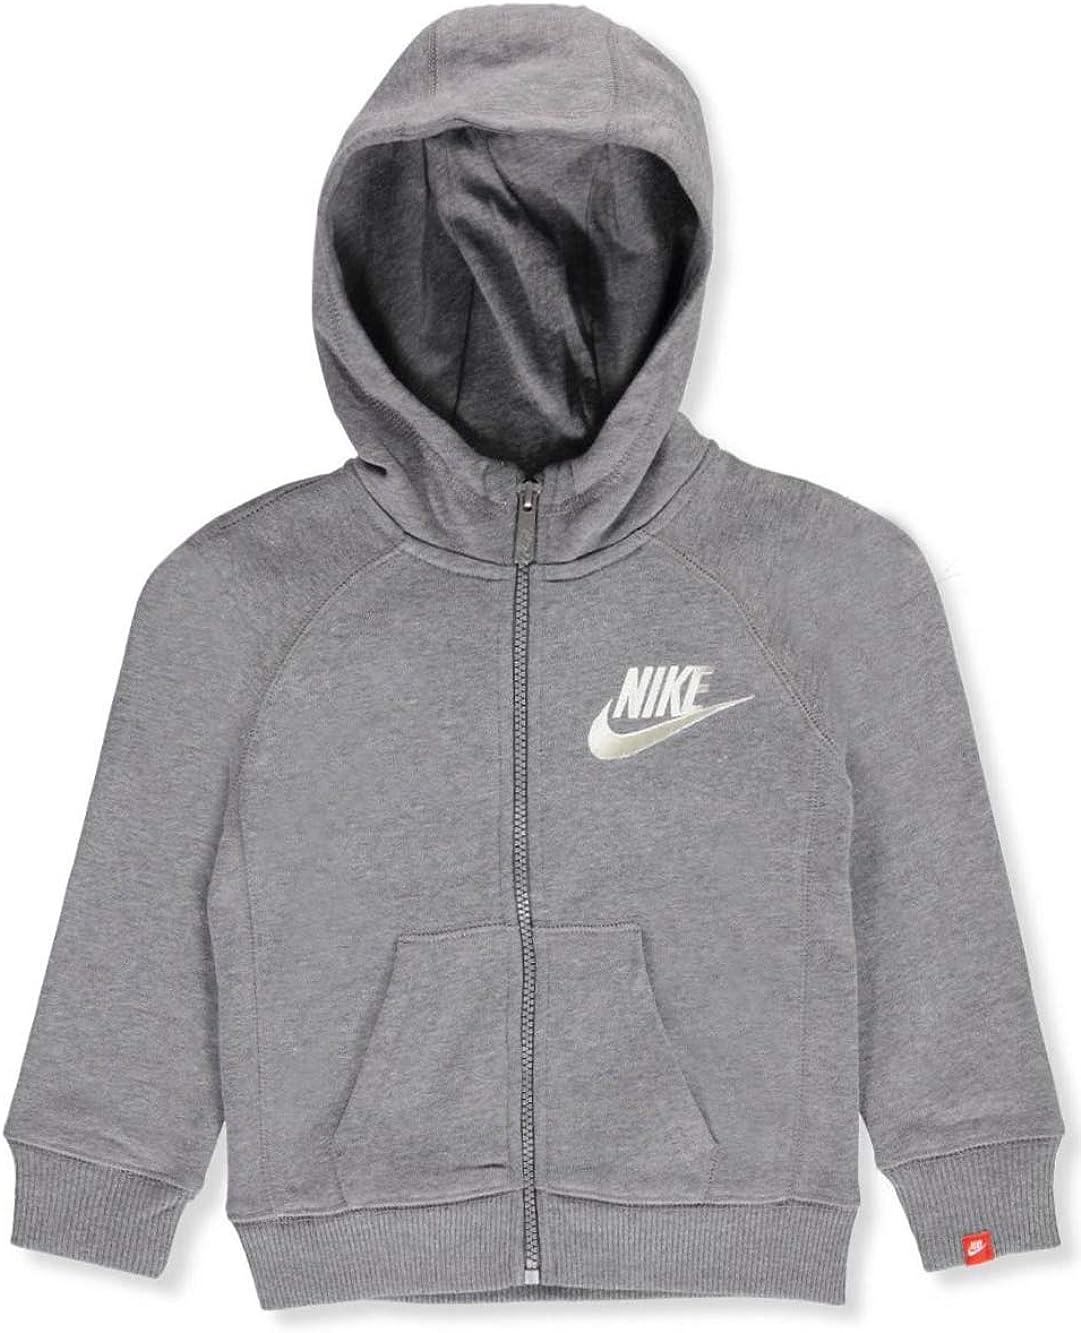 Nike Little Boys' Hoodie (Sizes 4 - 7)